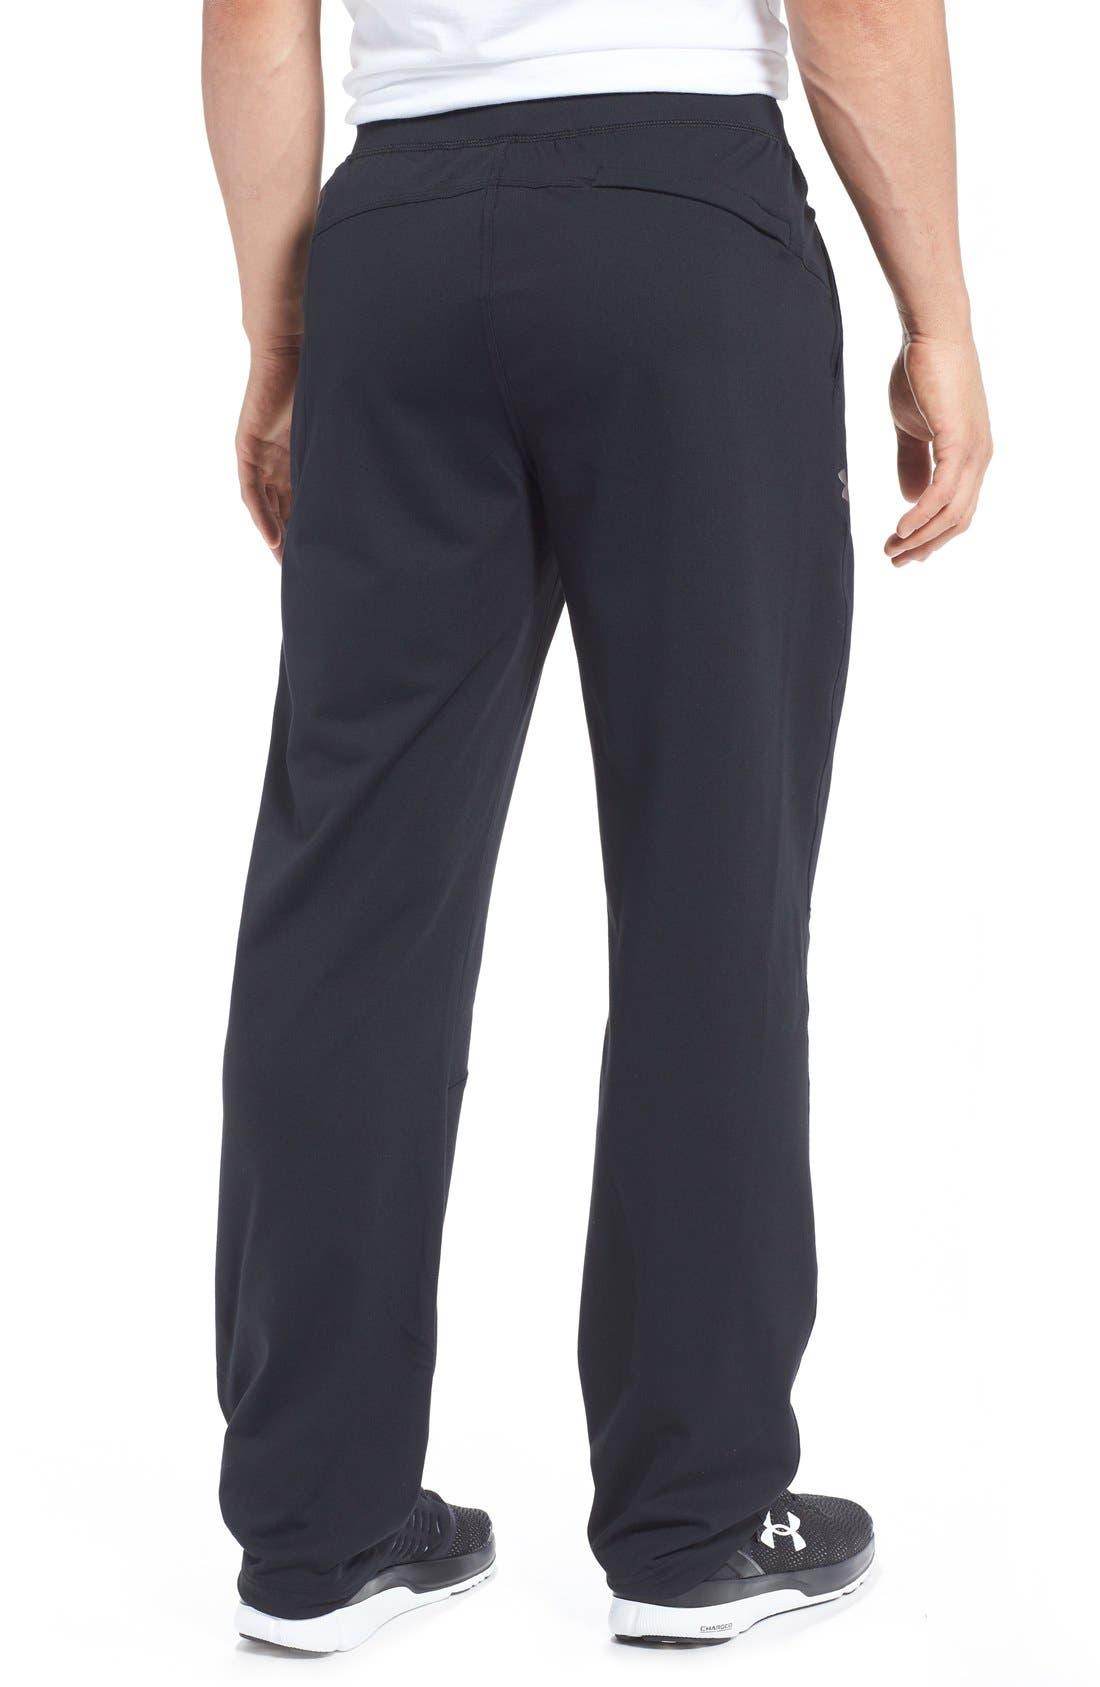 Alternate Image 2  - Under Armour Regular Fit Knit Training Pants